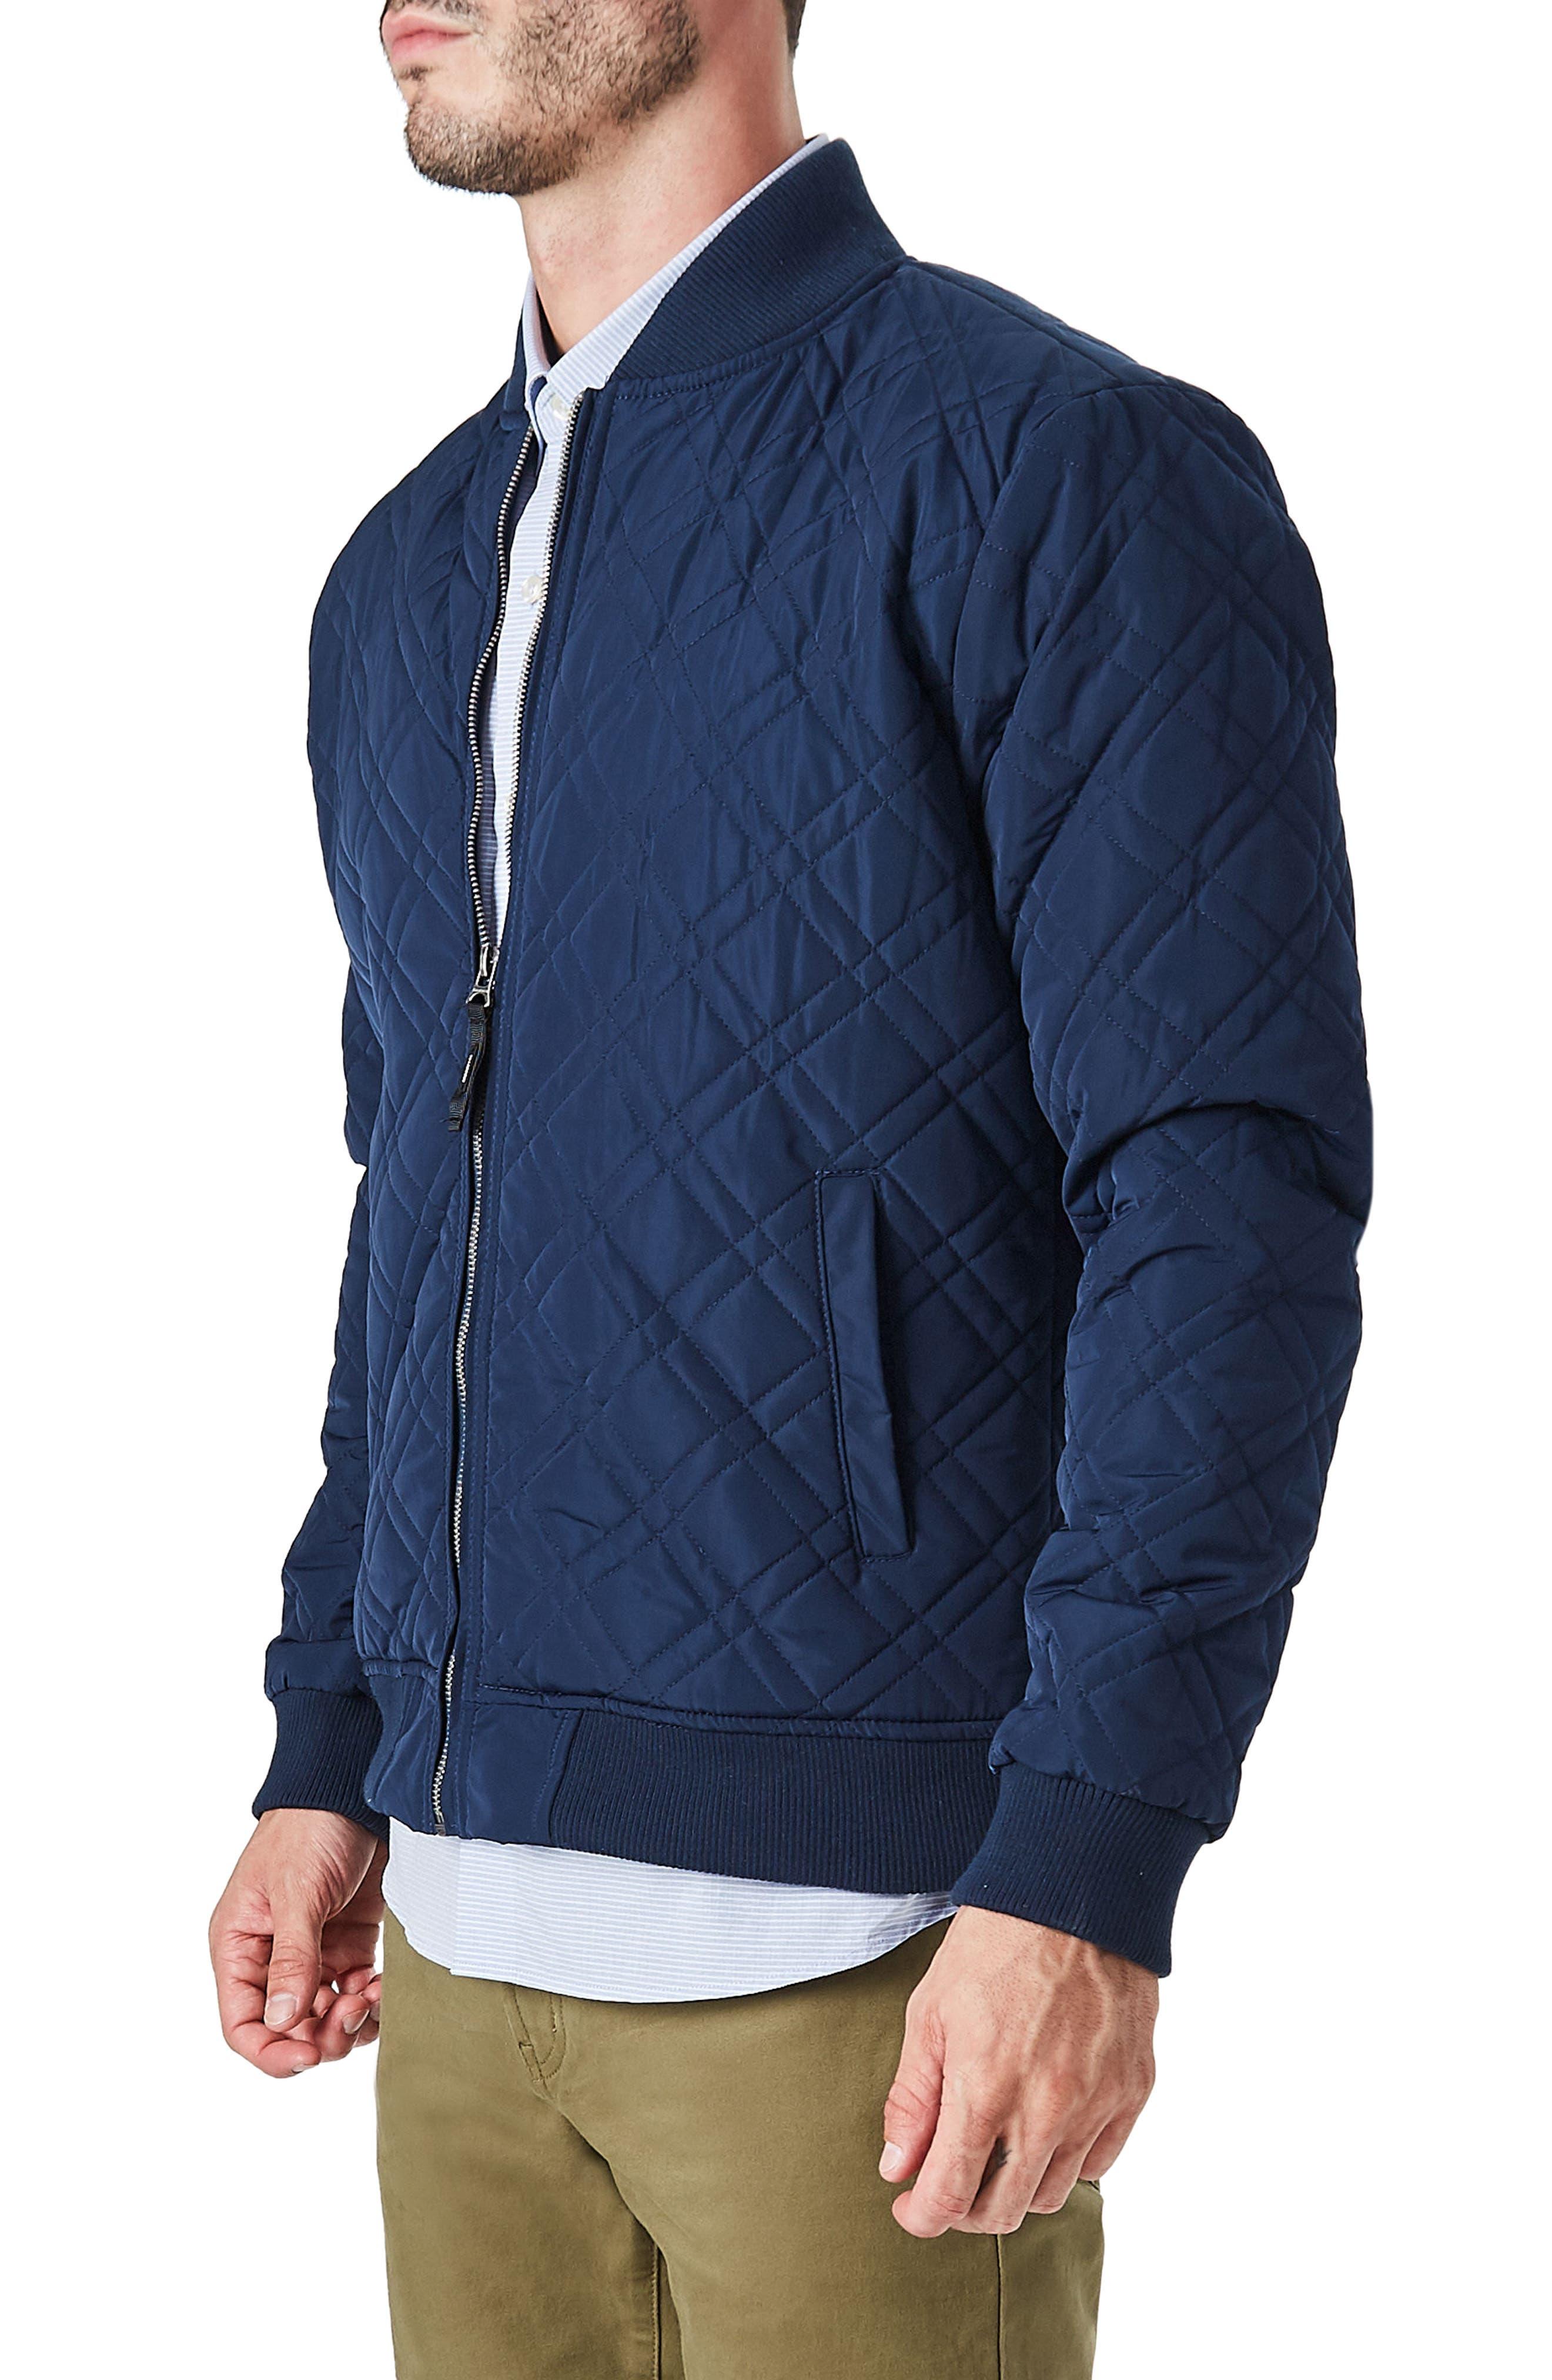 Arca Quilt Jacket,                             Alternate thumbnail 4, color,                             Navy